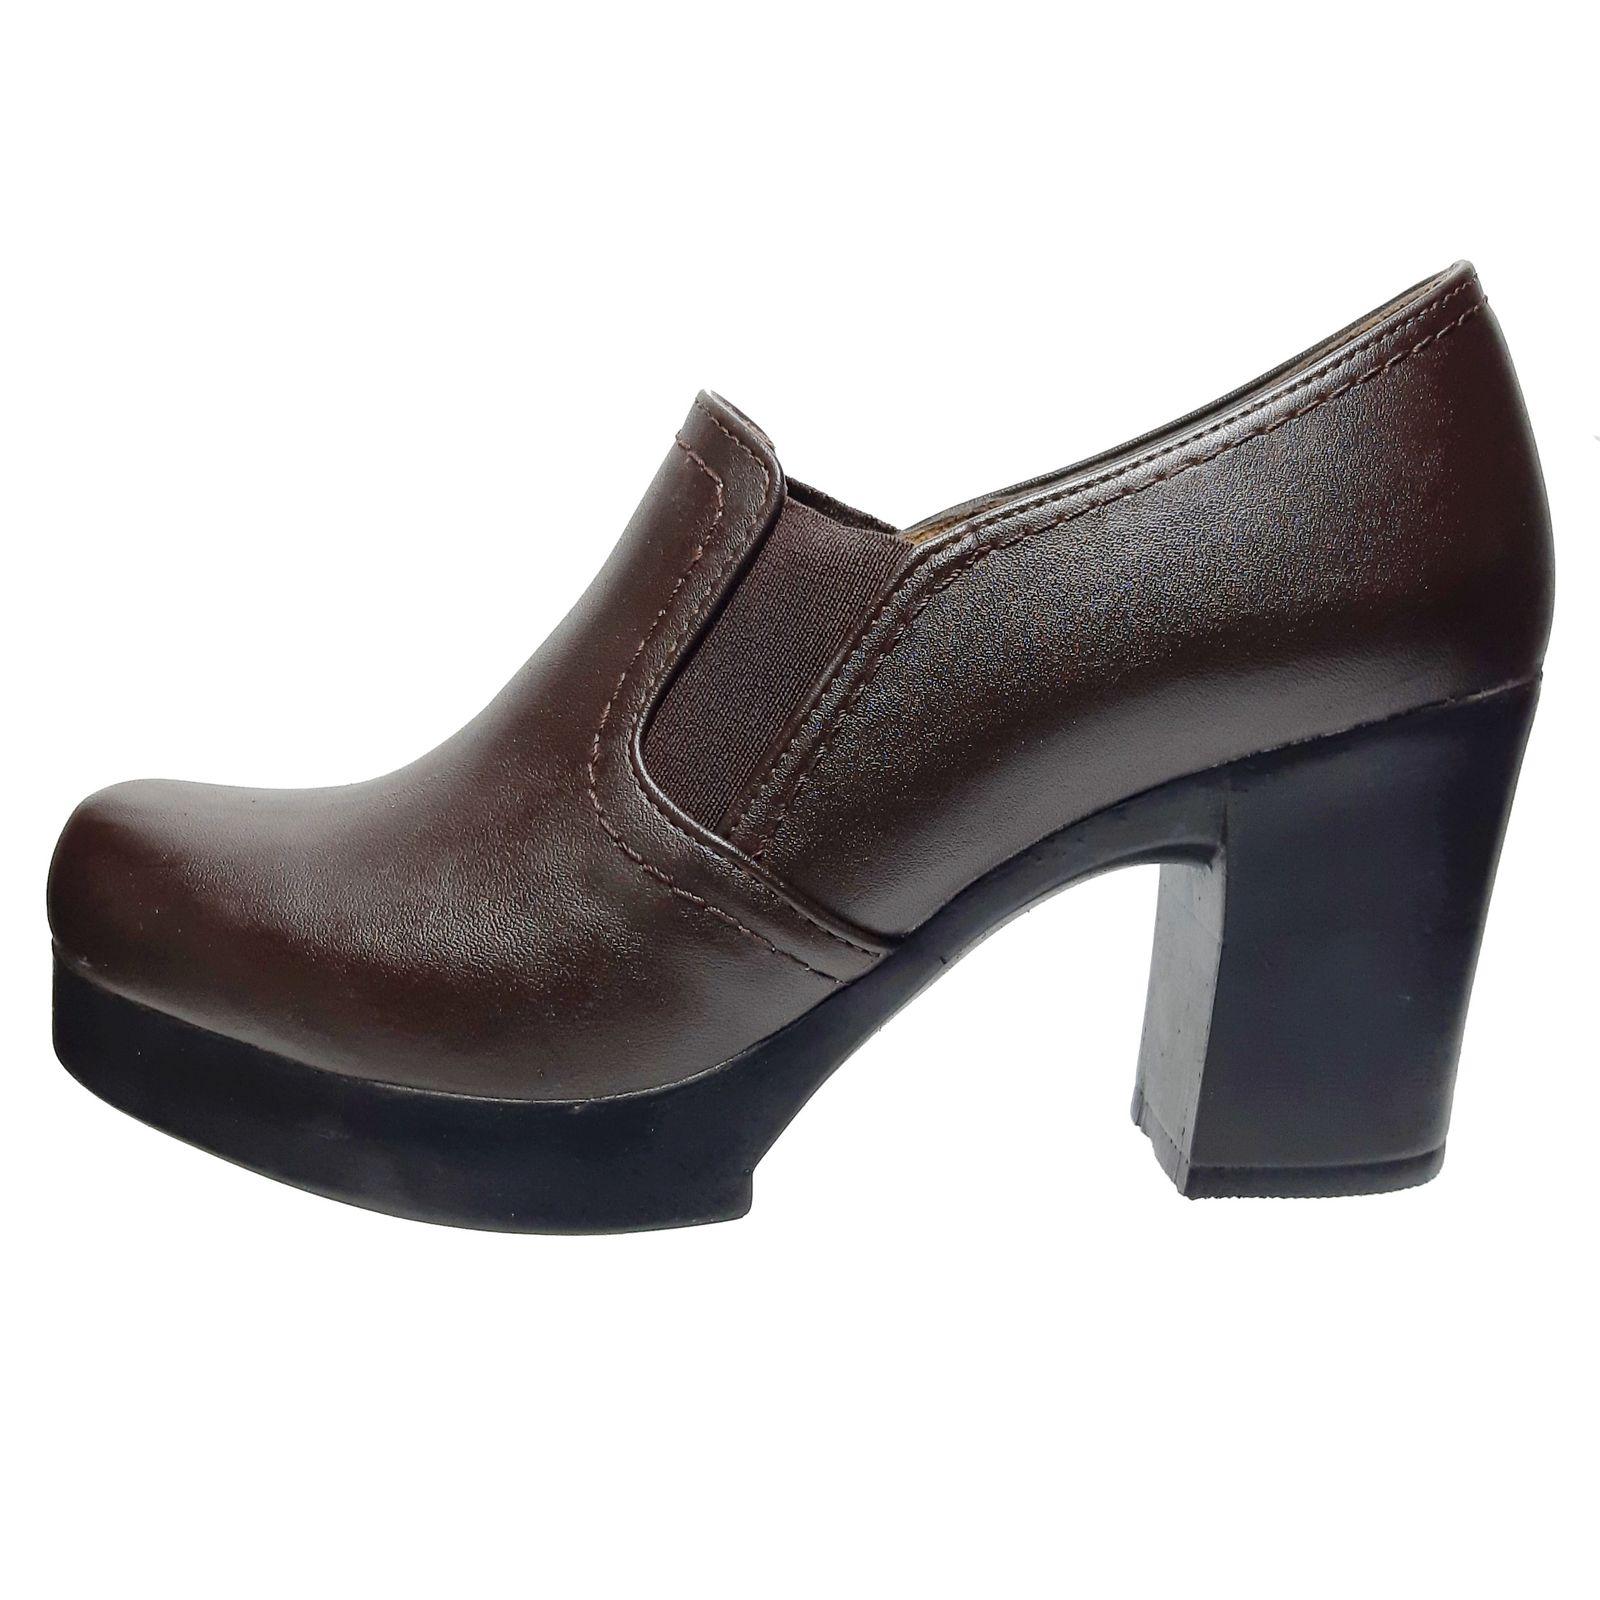 کفش زنانه مدل پرنس -  - 2